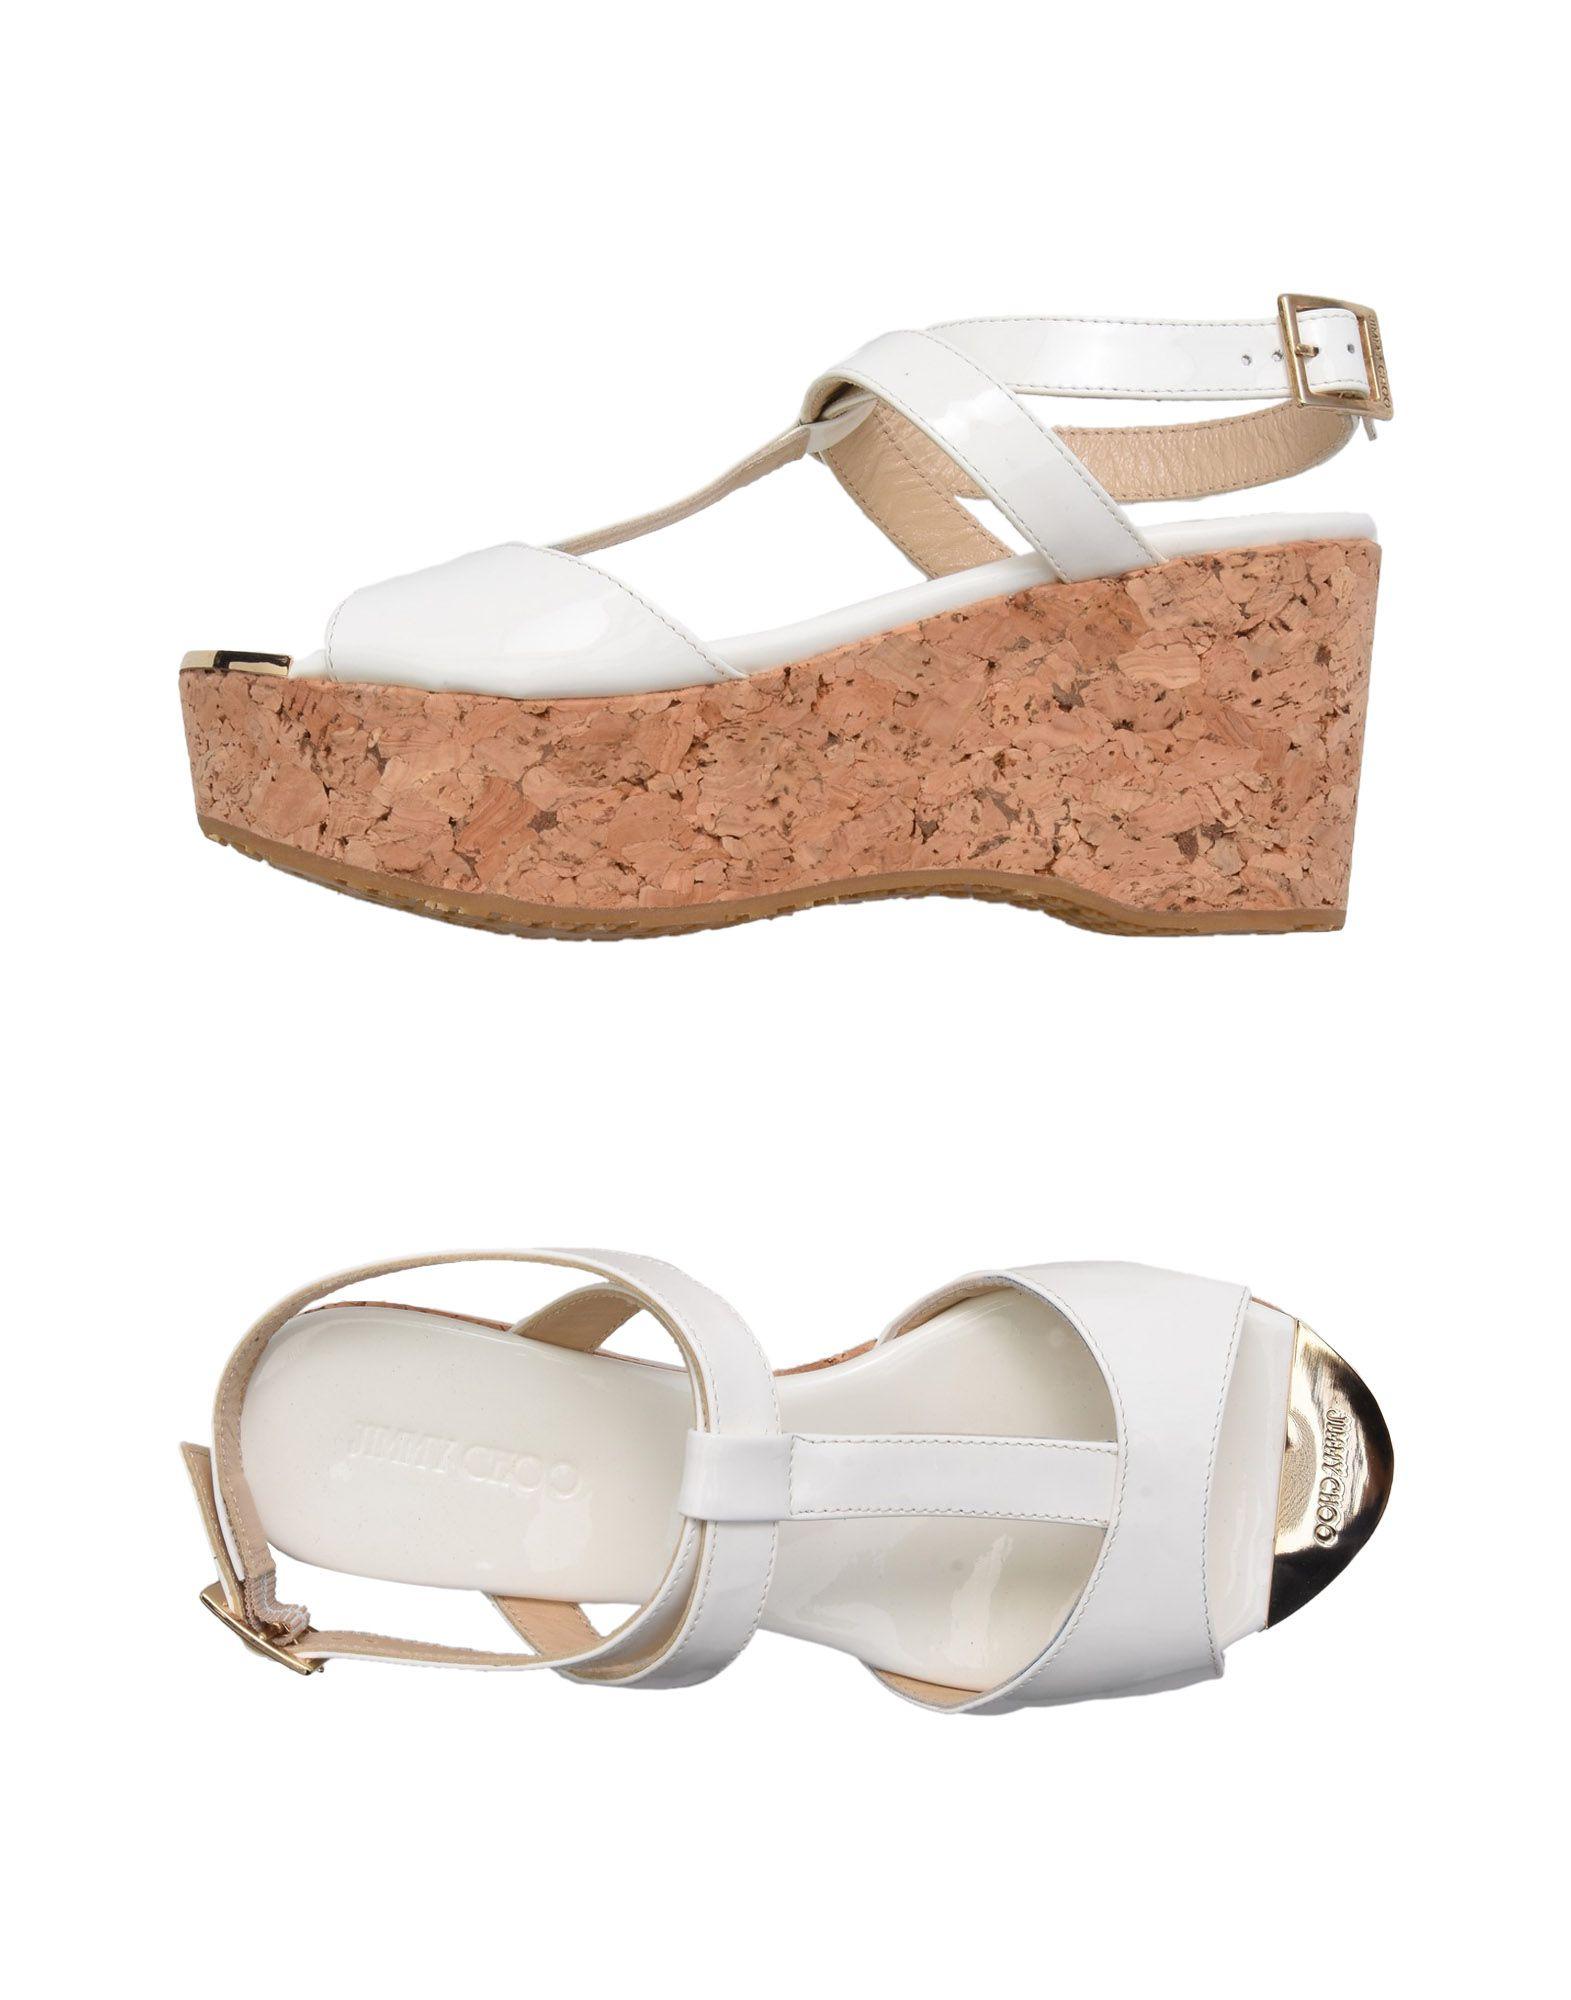 Jimmy Choo Sandals - Women Jimmy Choo Sandals online on 11478368VX  United Kingdom - 11478368VX on 20bd7d